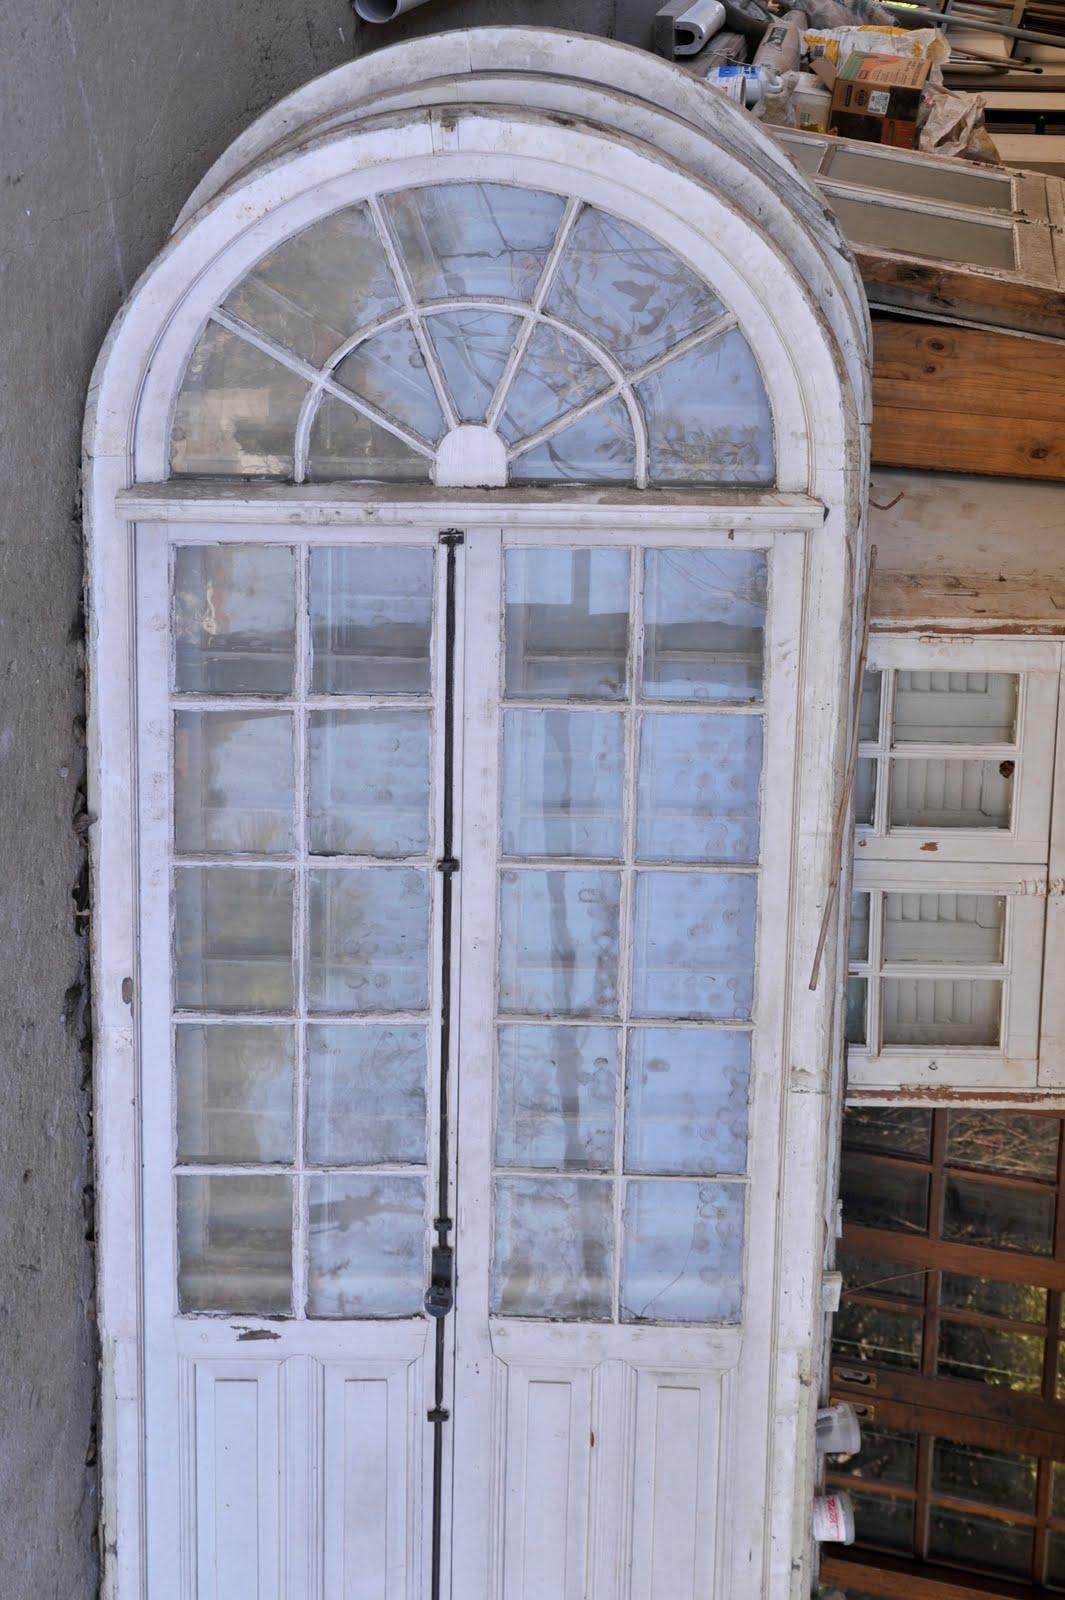 #69462F Portas e Janelas Antigas: Portas para reparo 2. 624 Janelas Madeira Arco